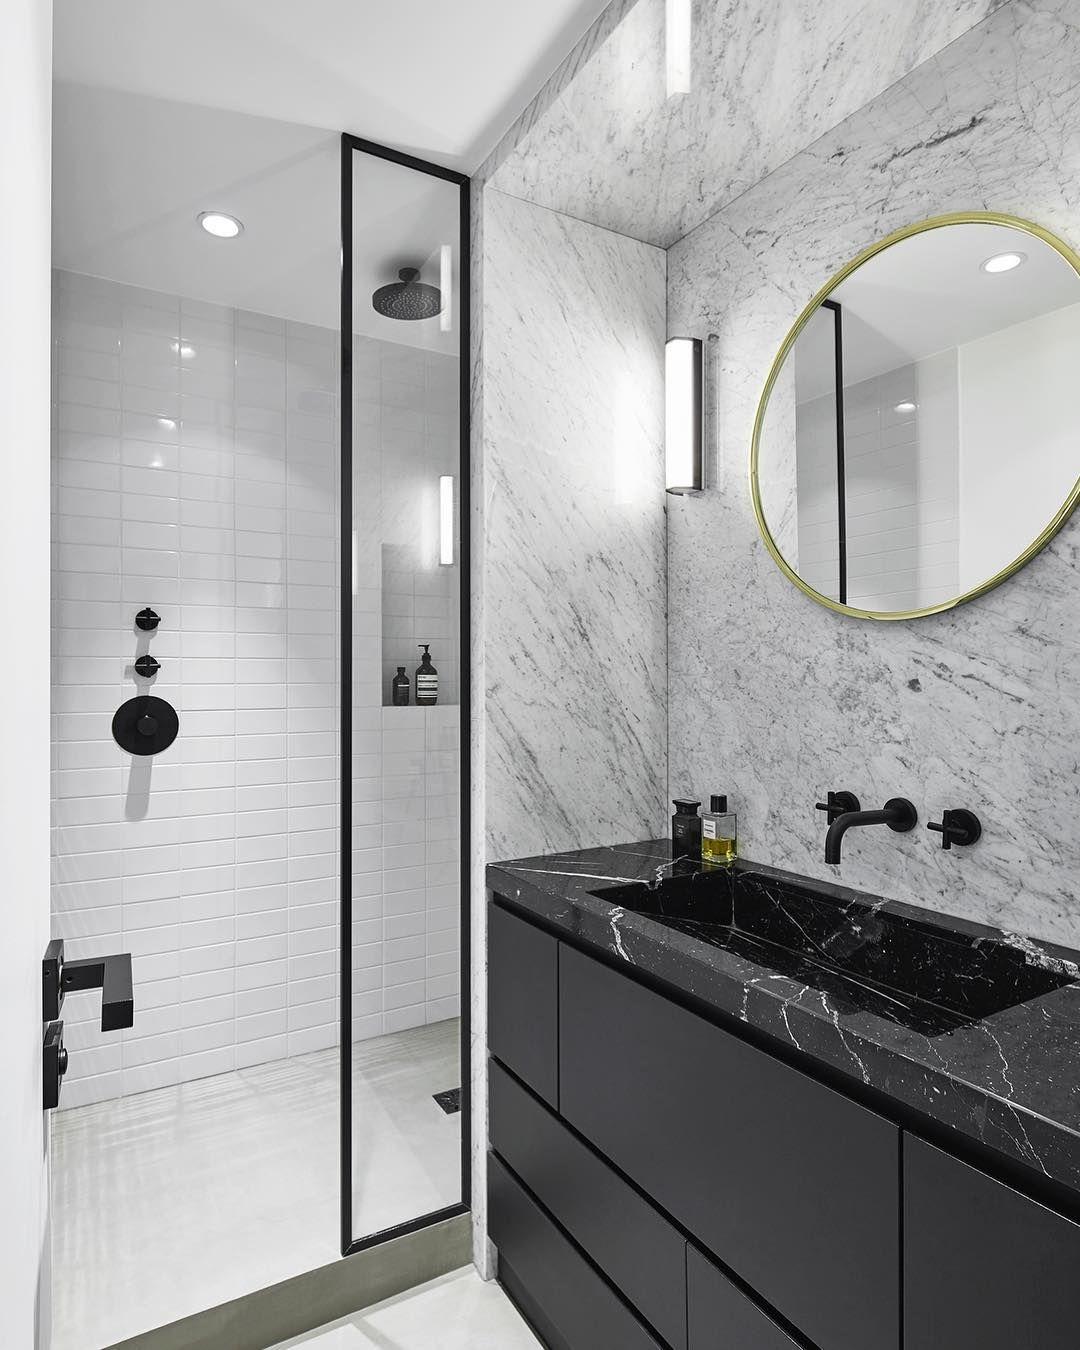 Pin By Cynthia Lee On Toilet Marble Bathroom Designs Black